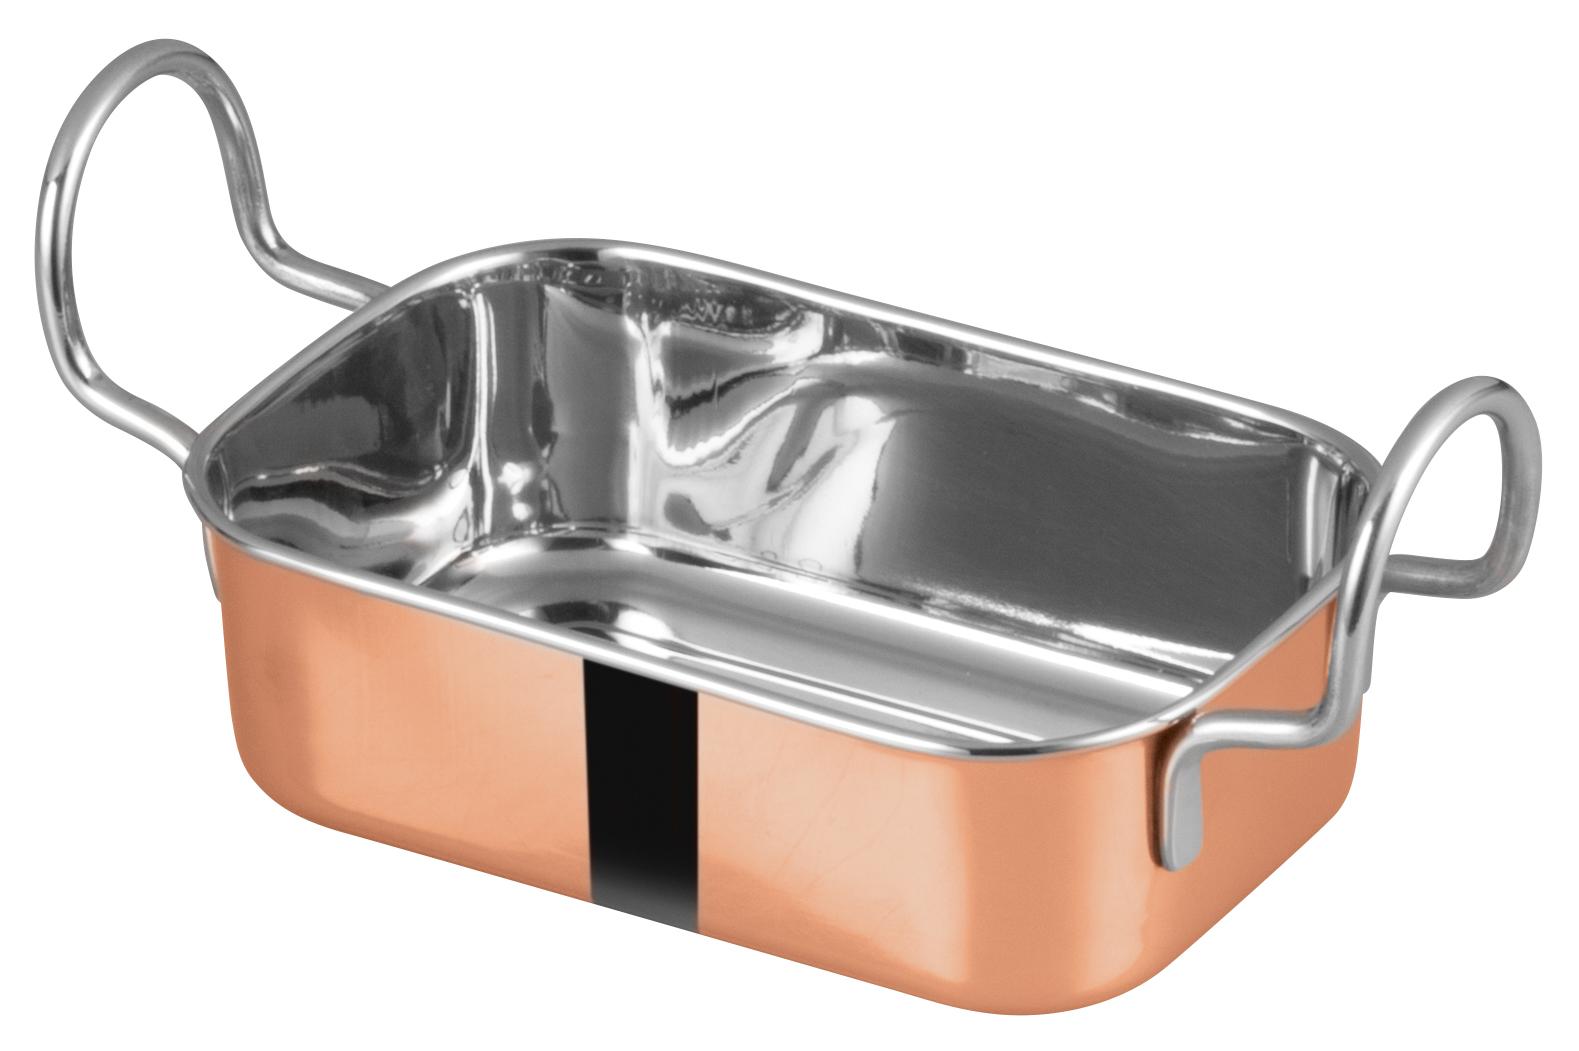 Winco DDSB-203C roasting pan